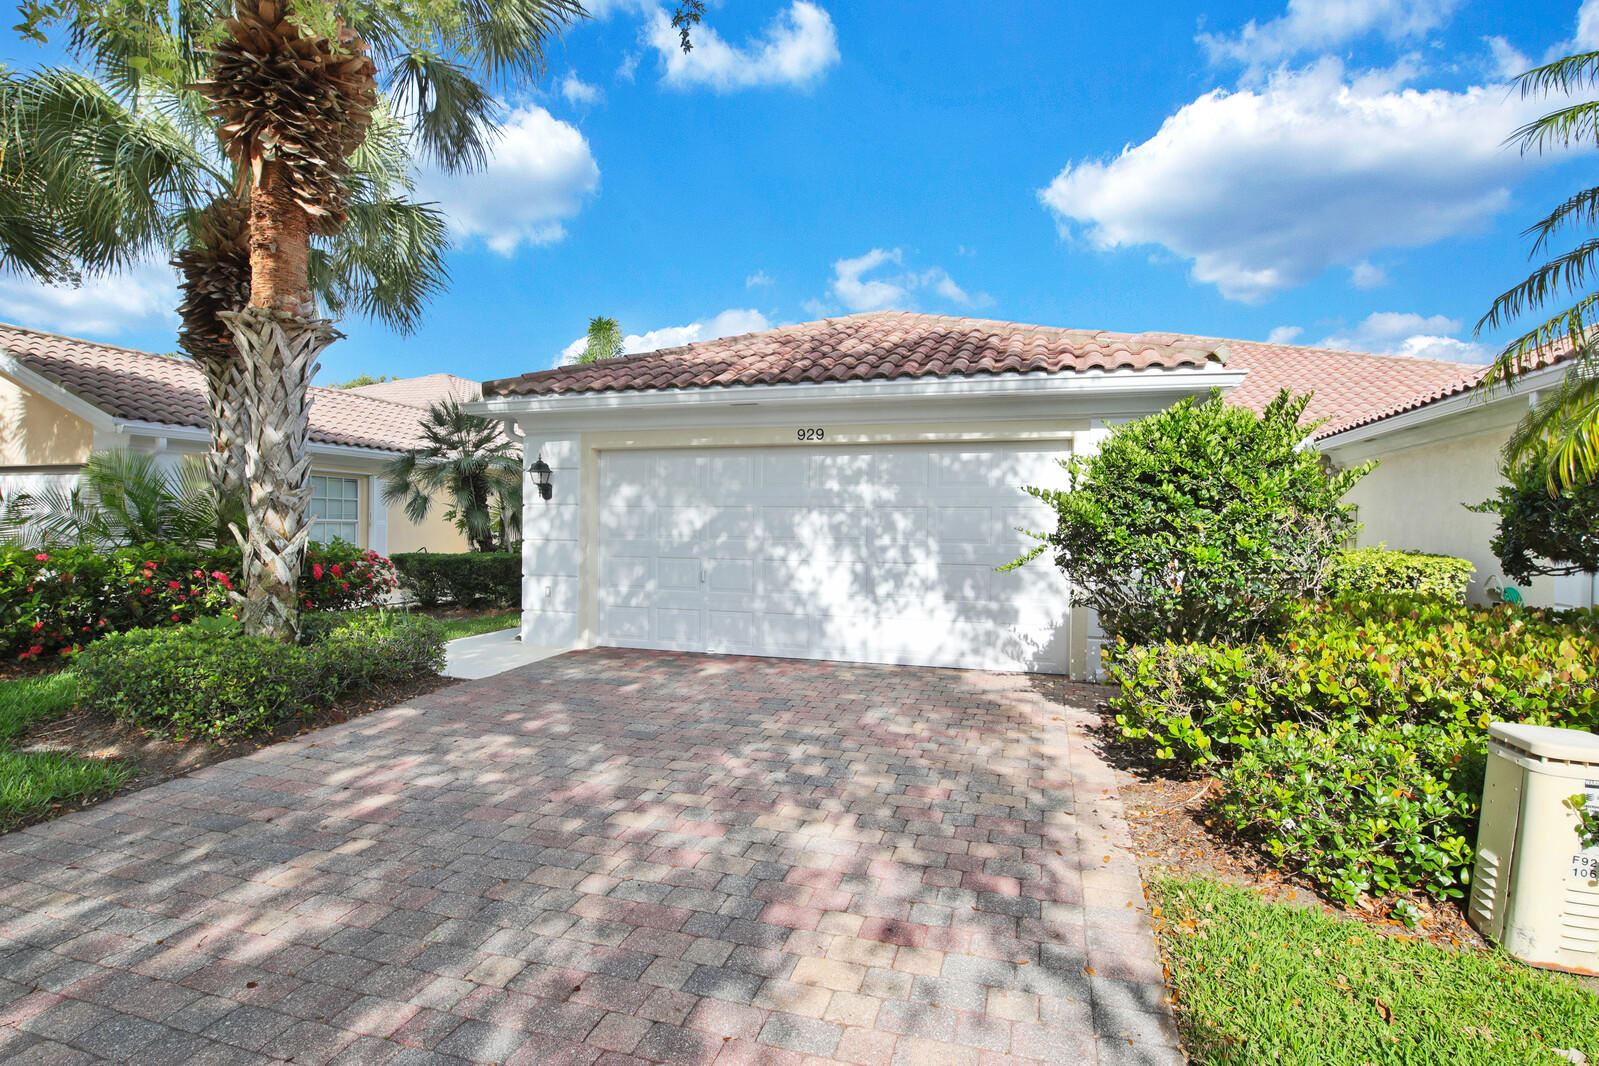 Photo of 929 Magdalena Road, Palm Beach Gardens, FL 33410 (MLS # RX-10716192)